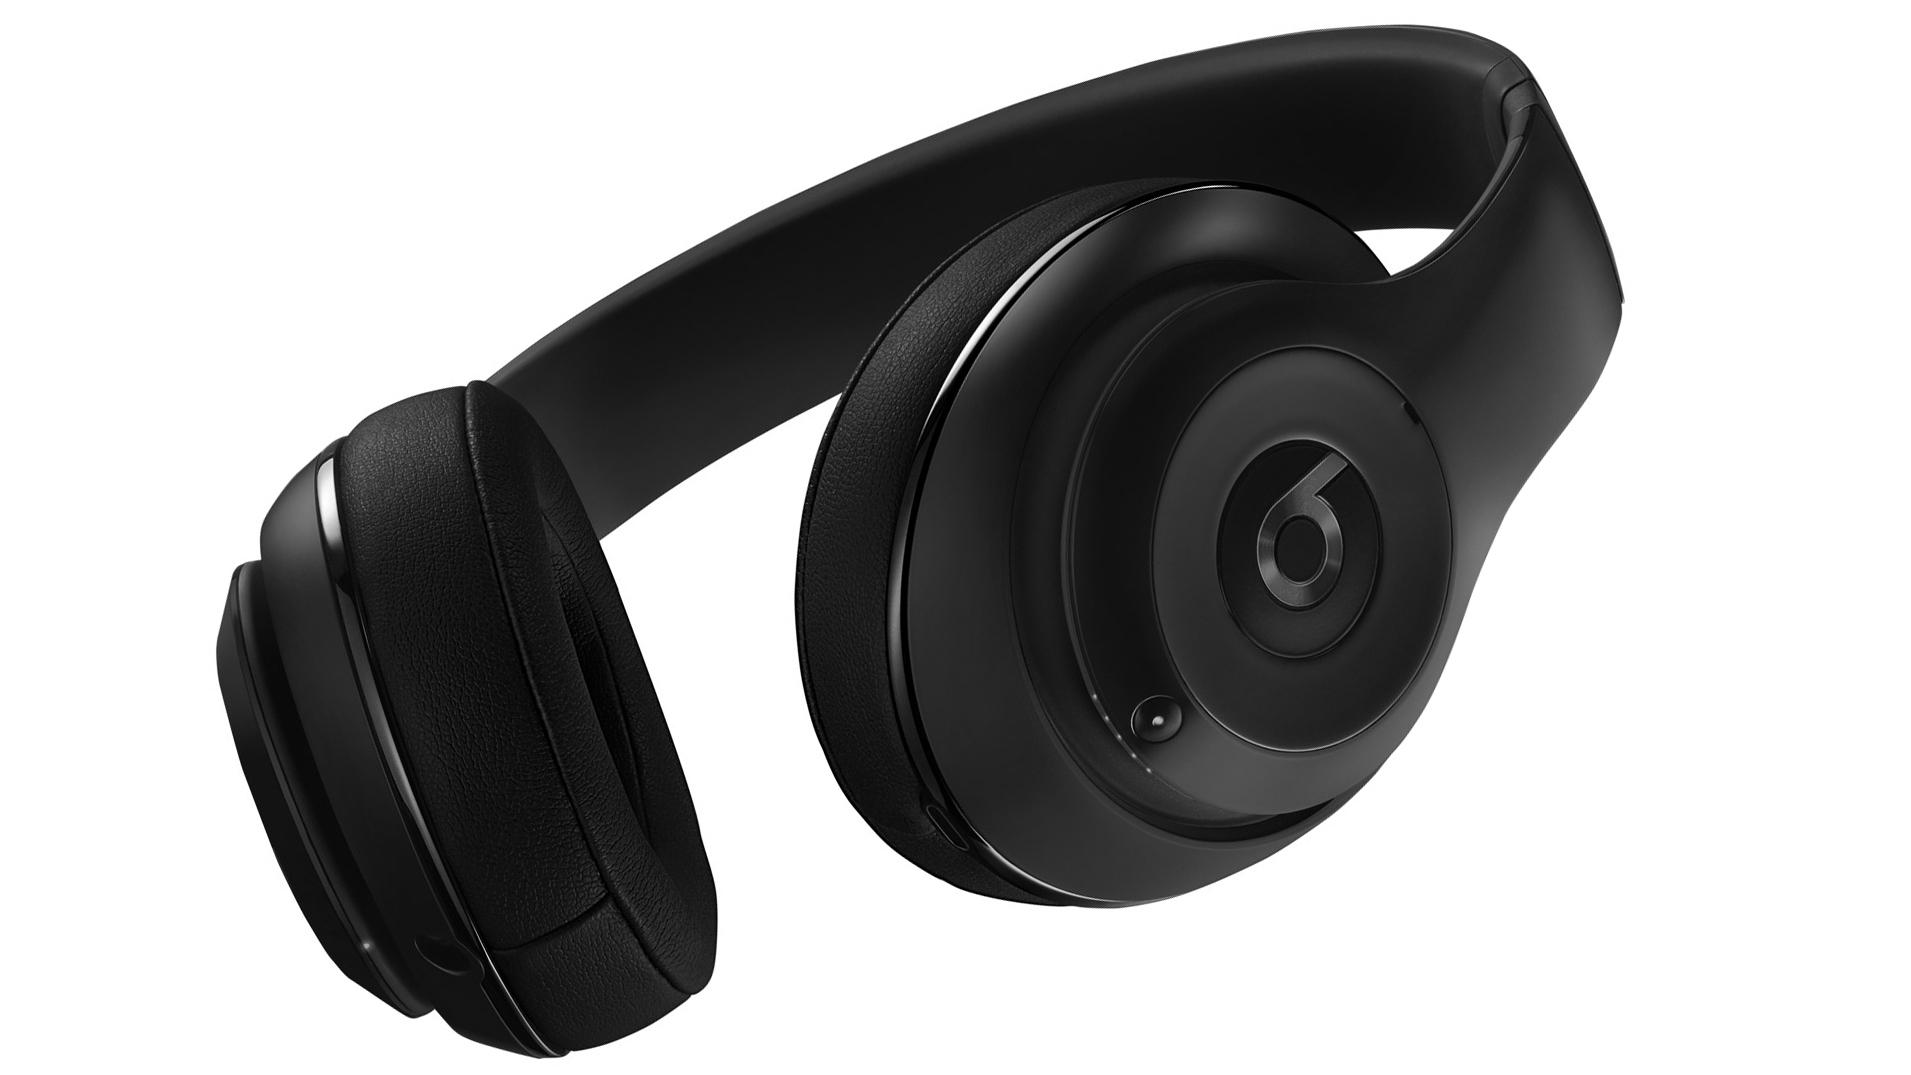 Bluetooth Headphones Beats Studio Over Ear 264 Reg 300 More 9to5toys